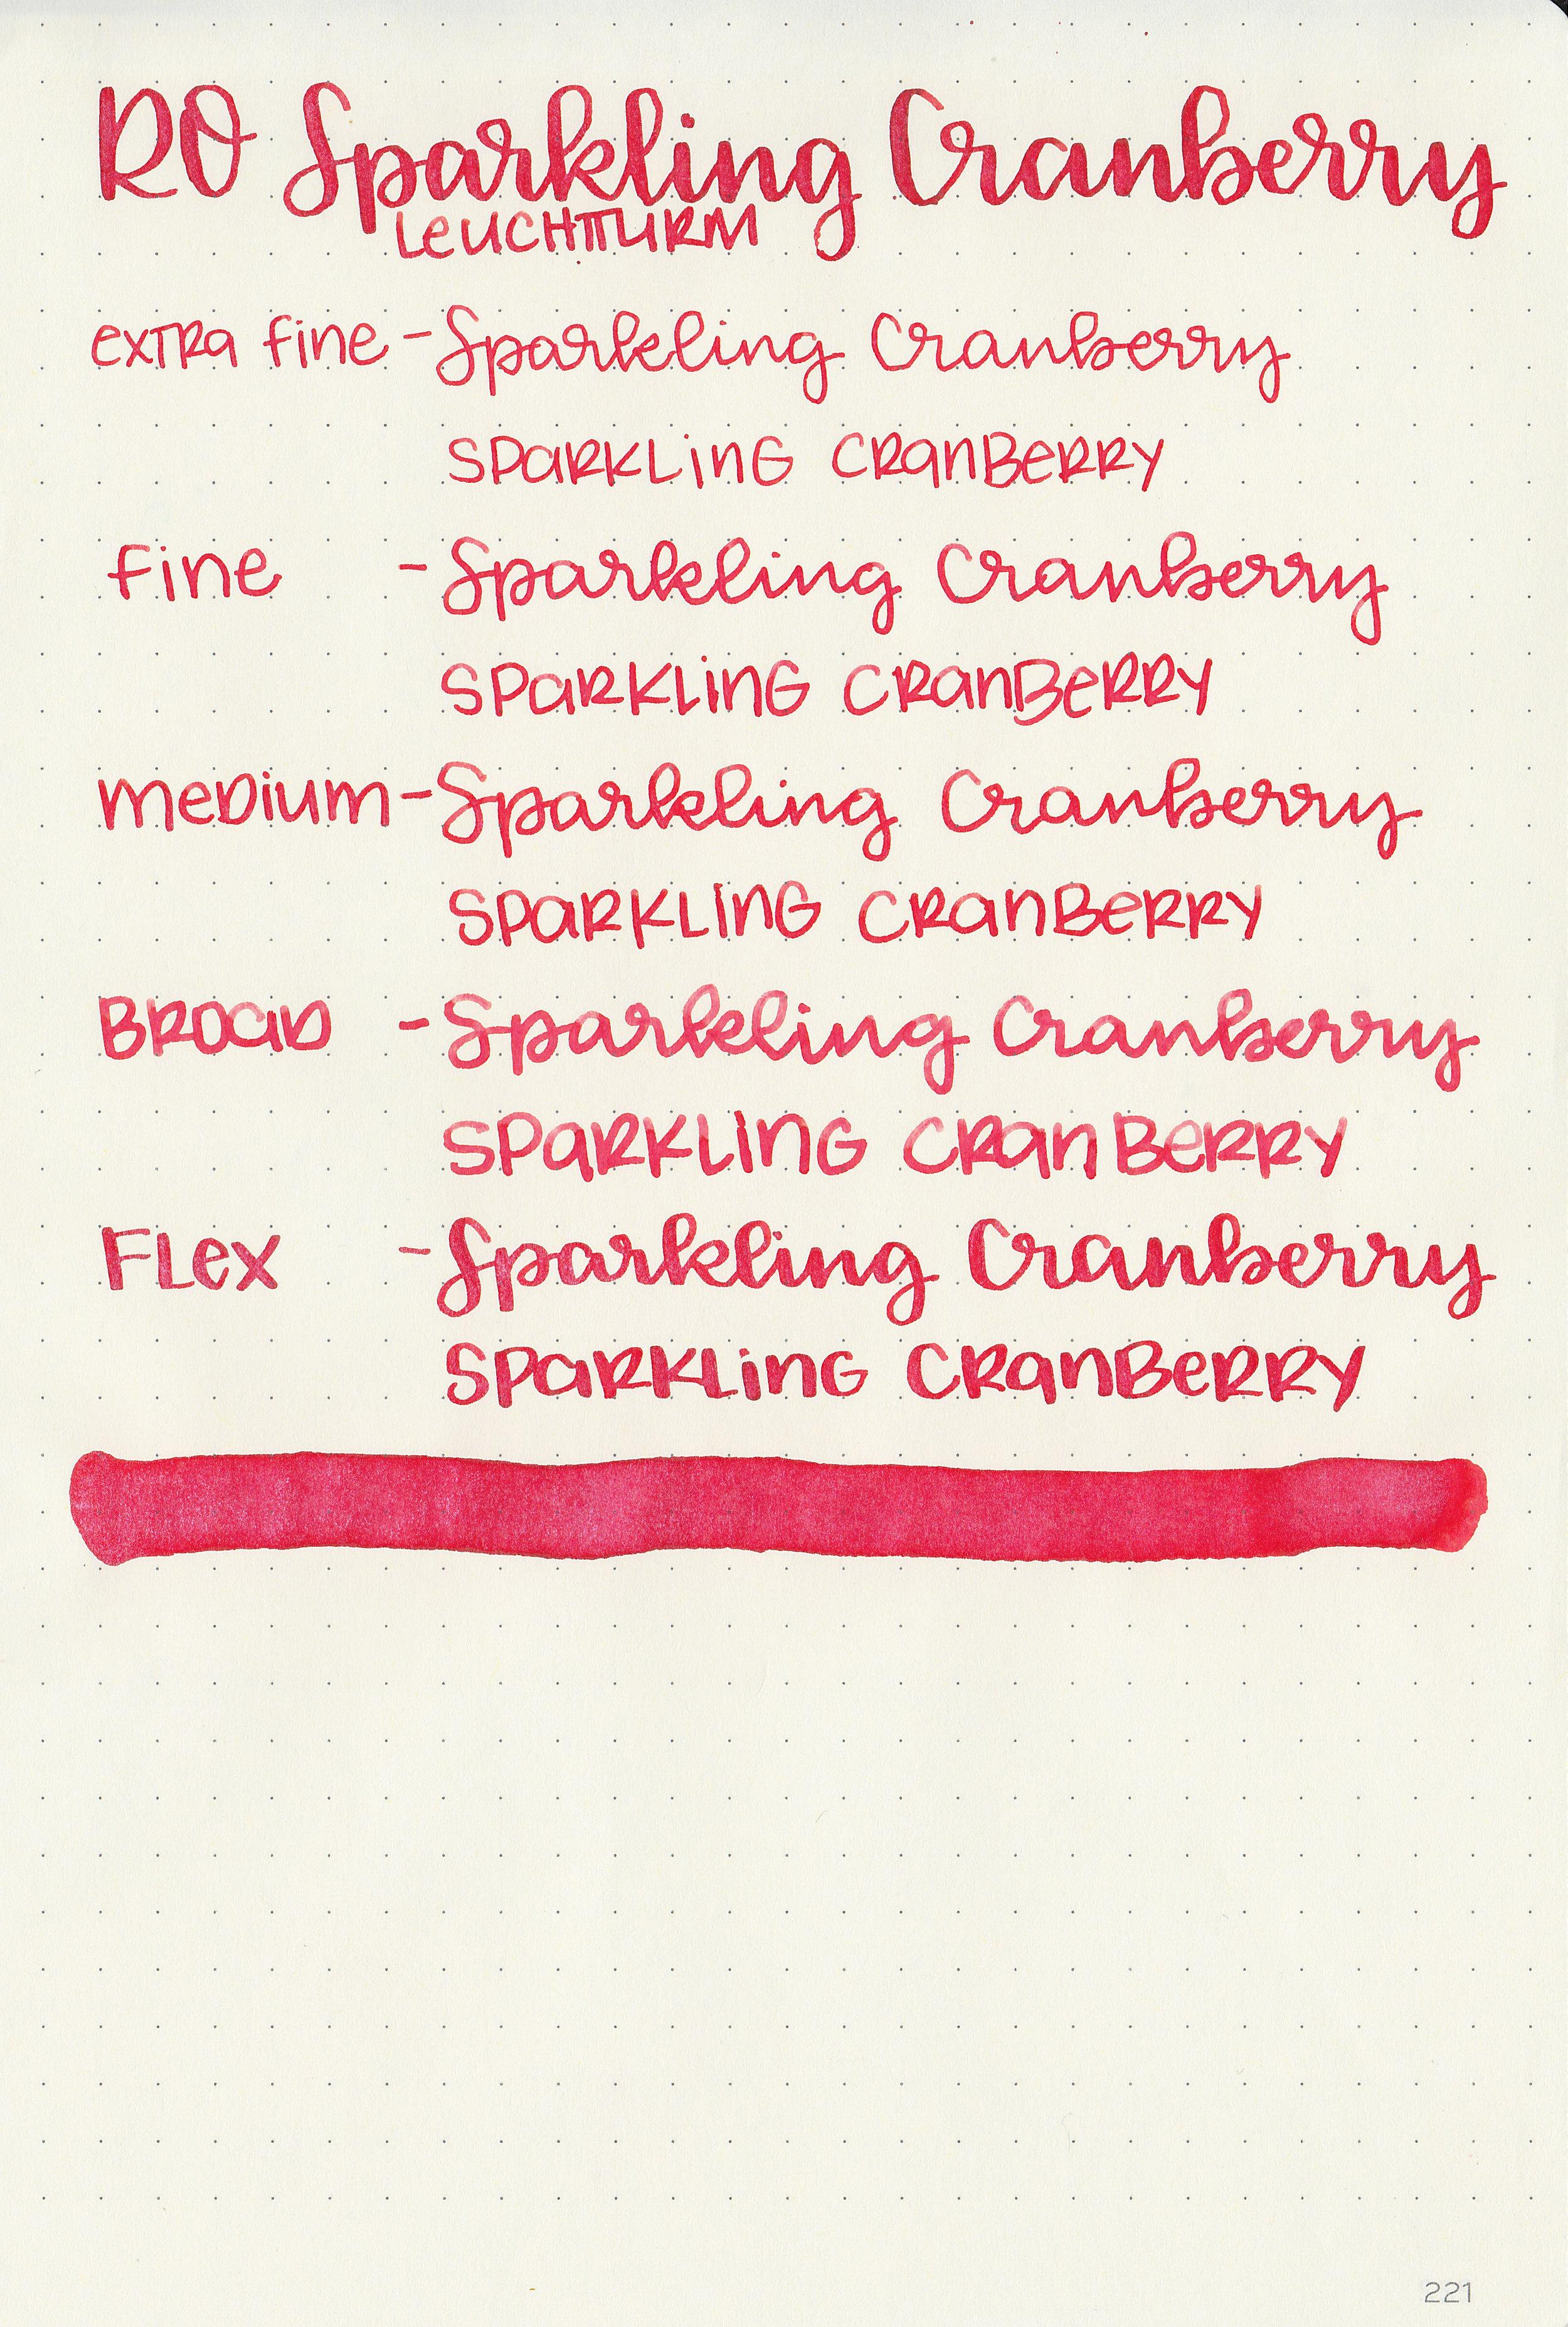 ro-sparkling-cranberry-8.jpg